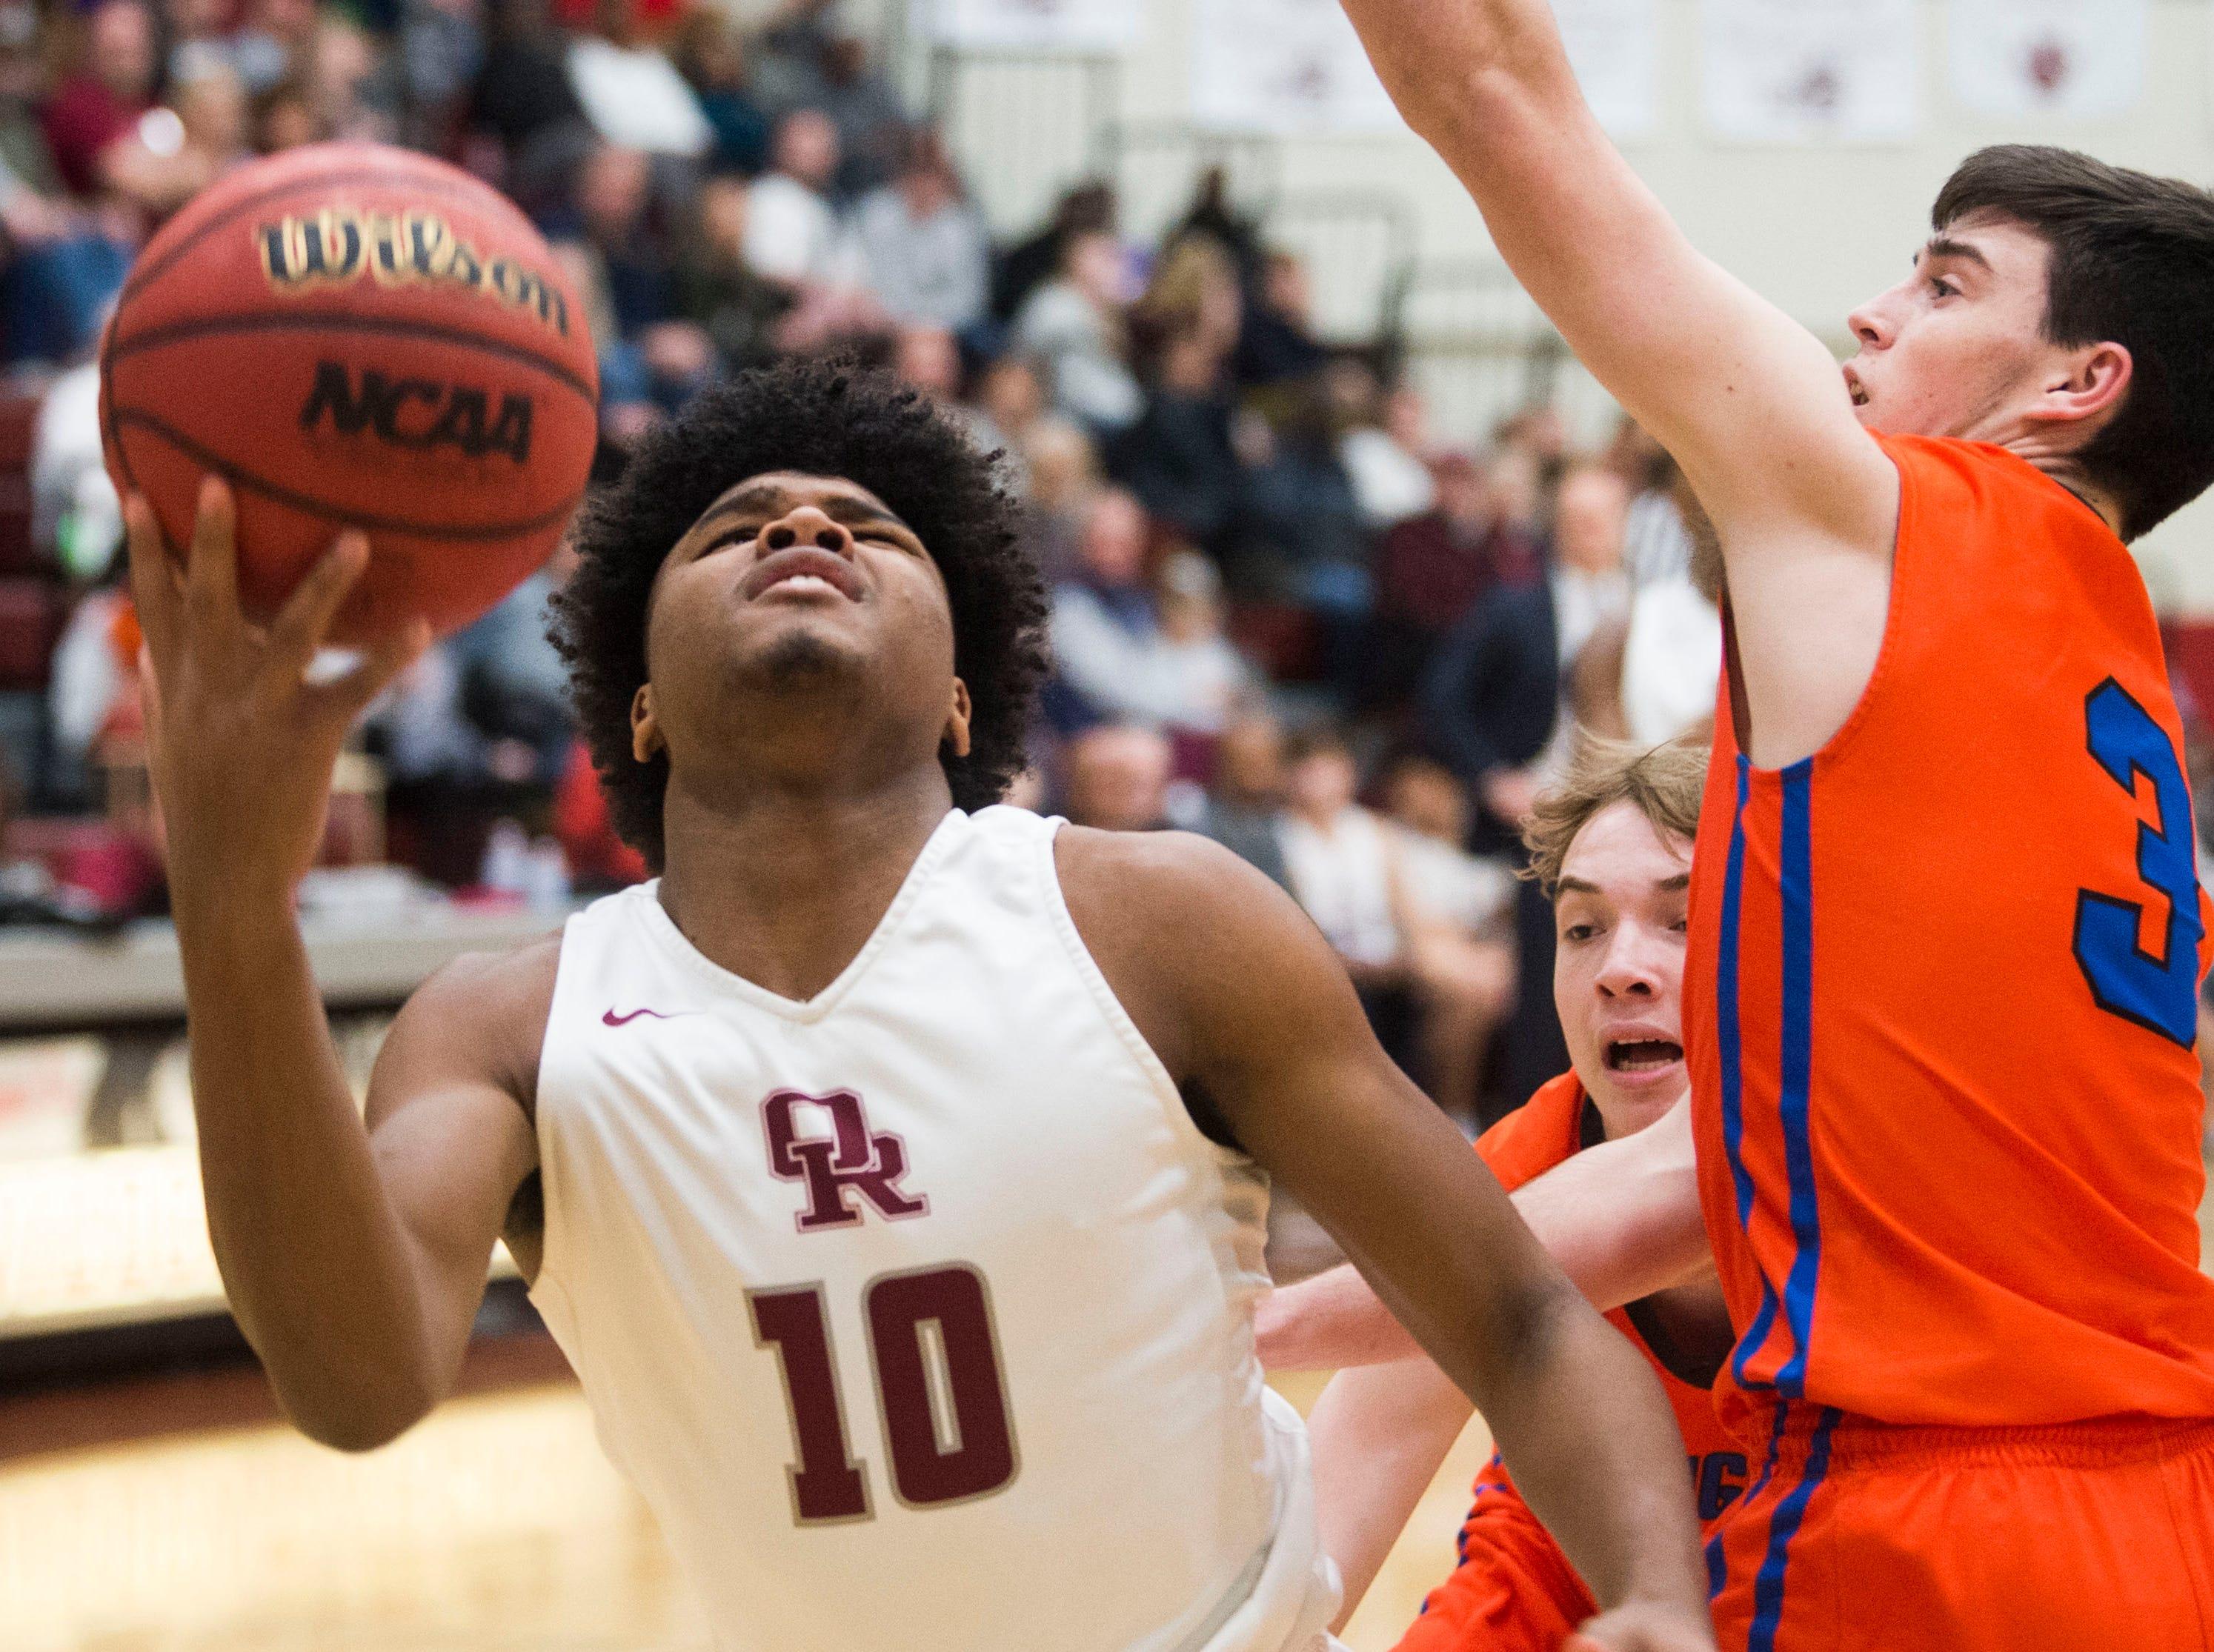 Oak Ridge's Herbert Booker (10) takes a shot during a high school basketball game between Oak Ridge and Campbell County at Oak Ridge Friday, Feb. 1, 2019.